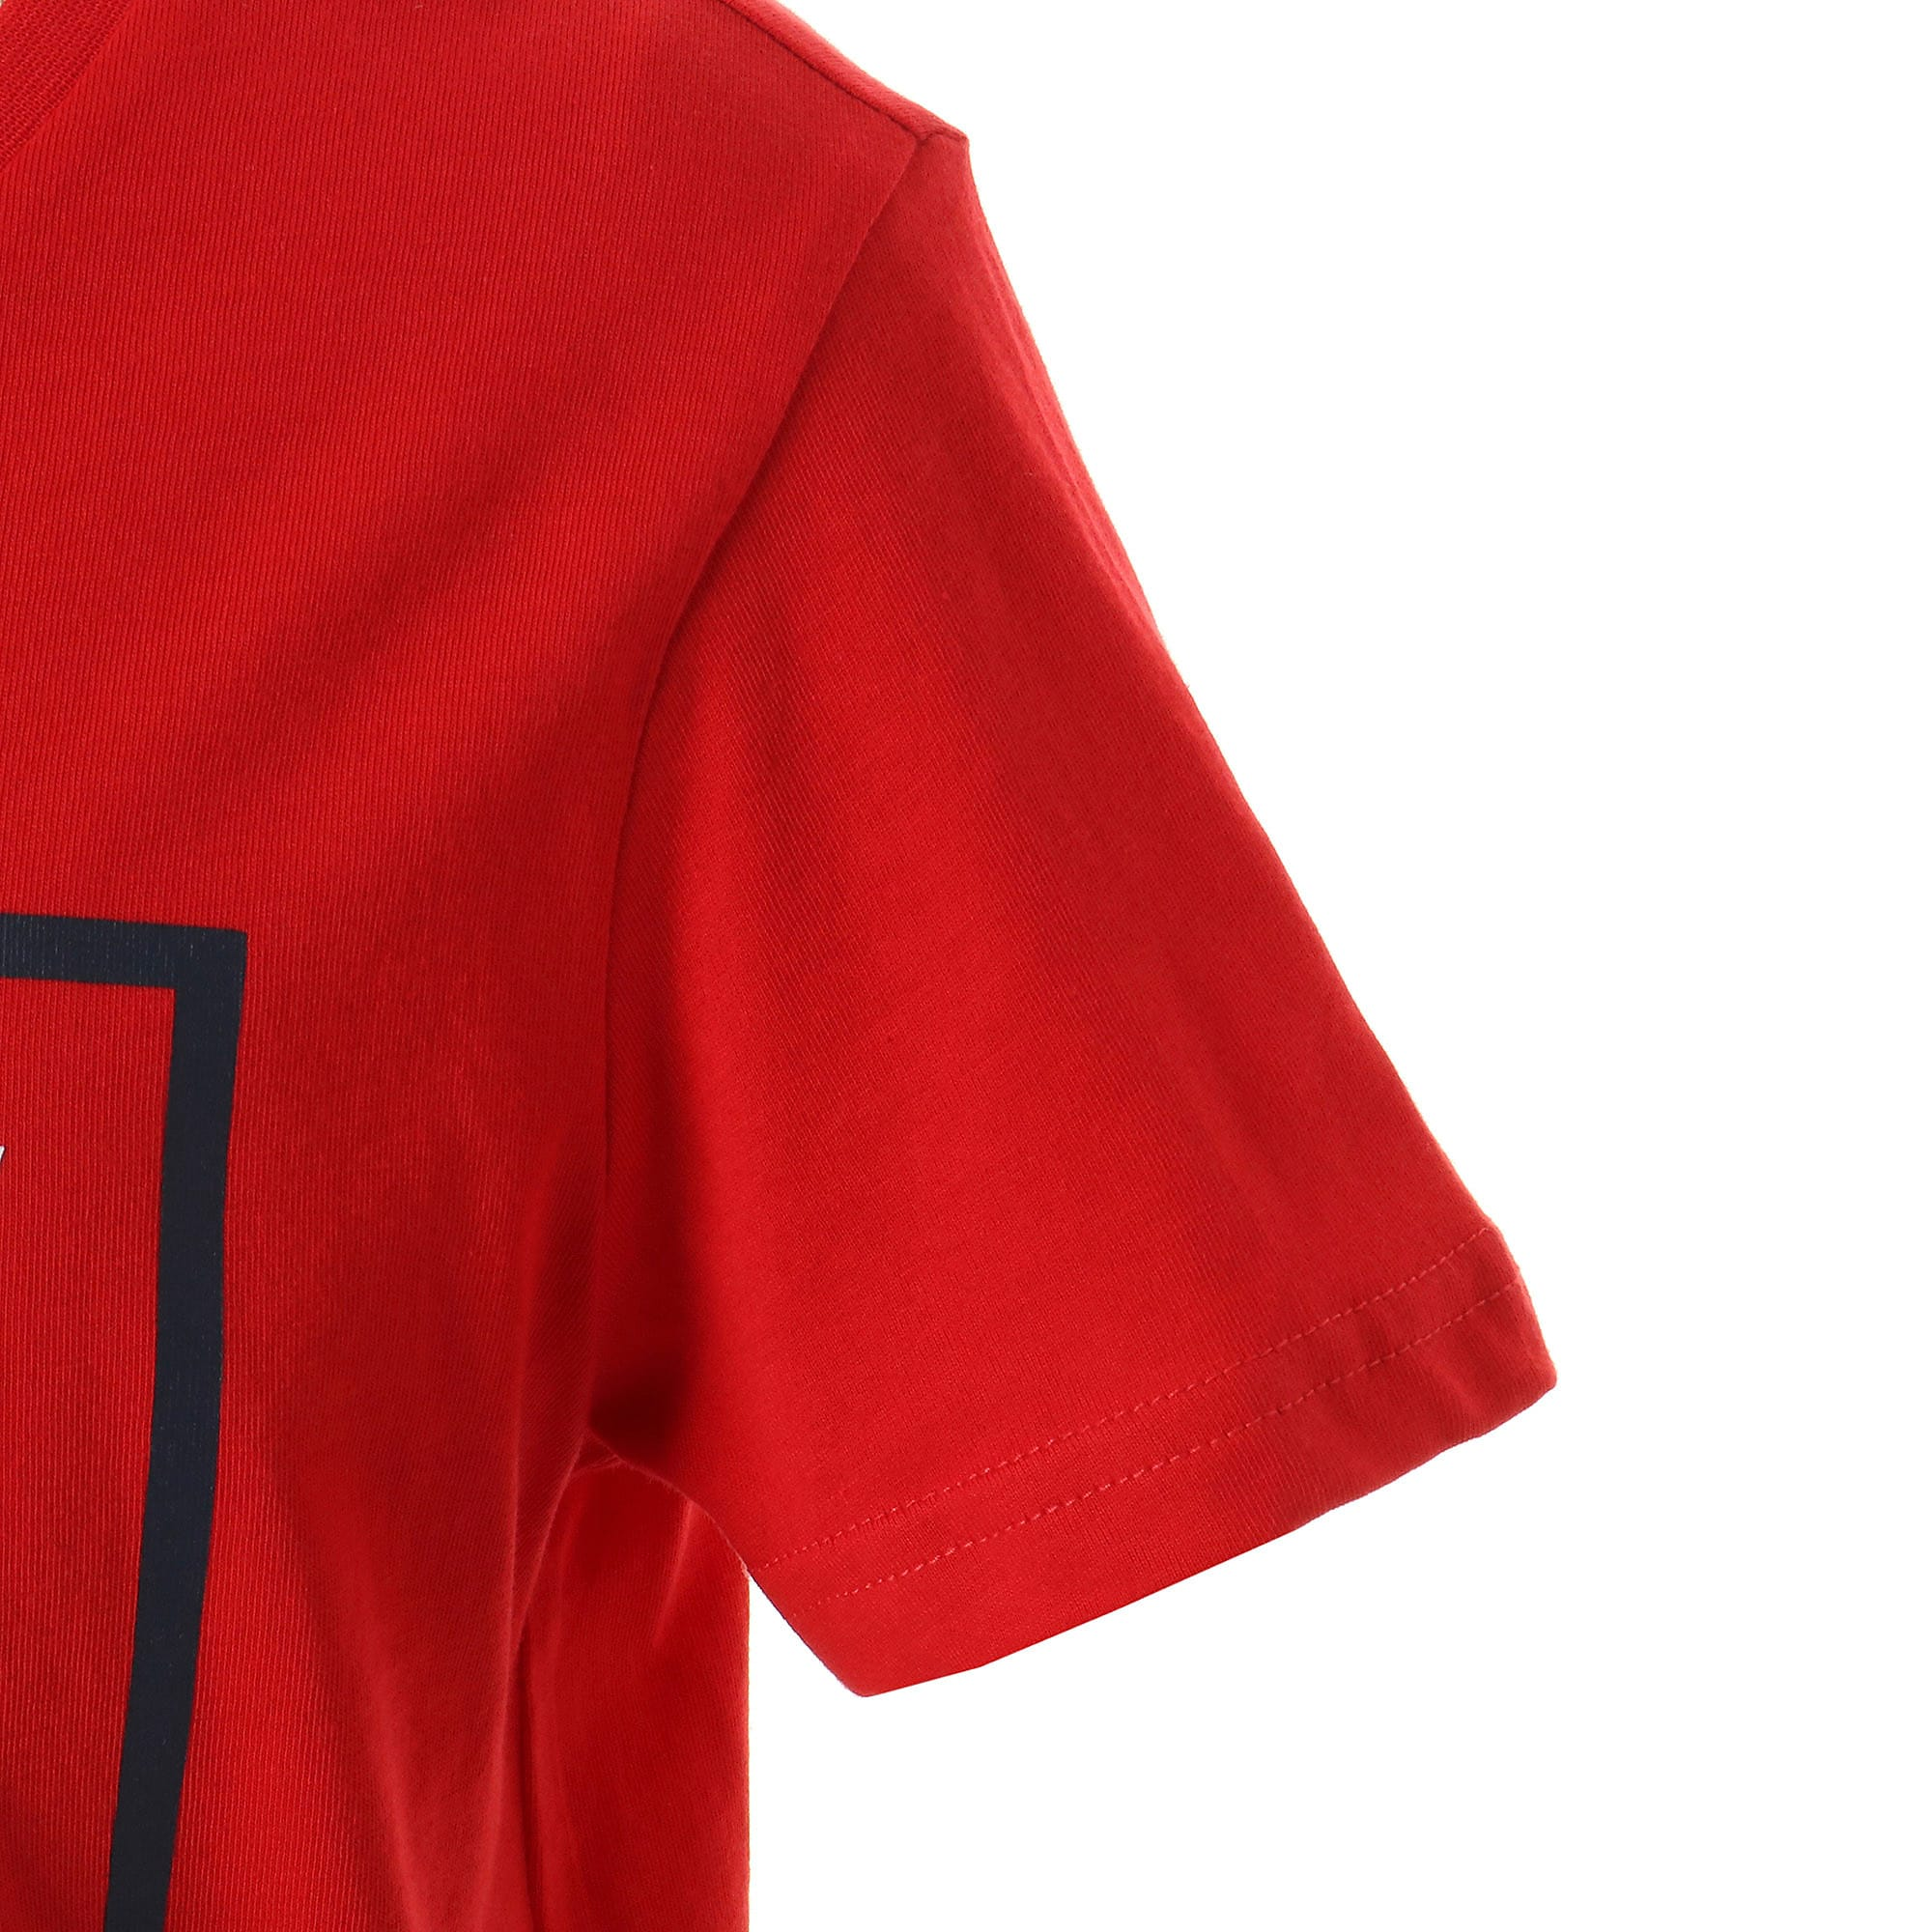 Thumbnail 5 of キッズ ALPHA SS グラフィック Tシャツ 半袖, High Risk Red, medium-JPN